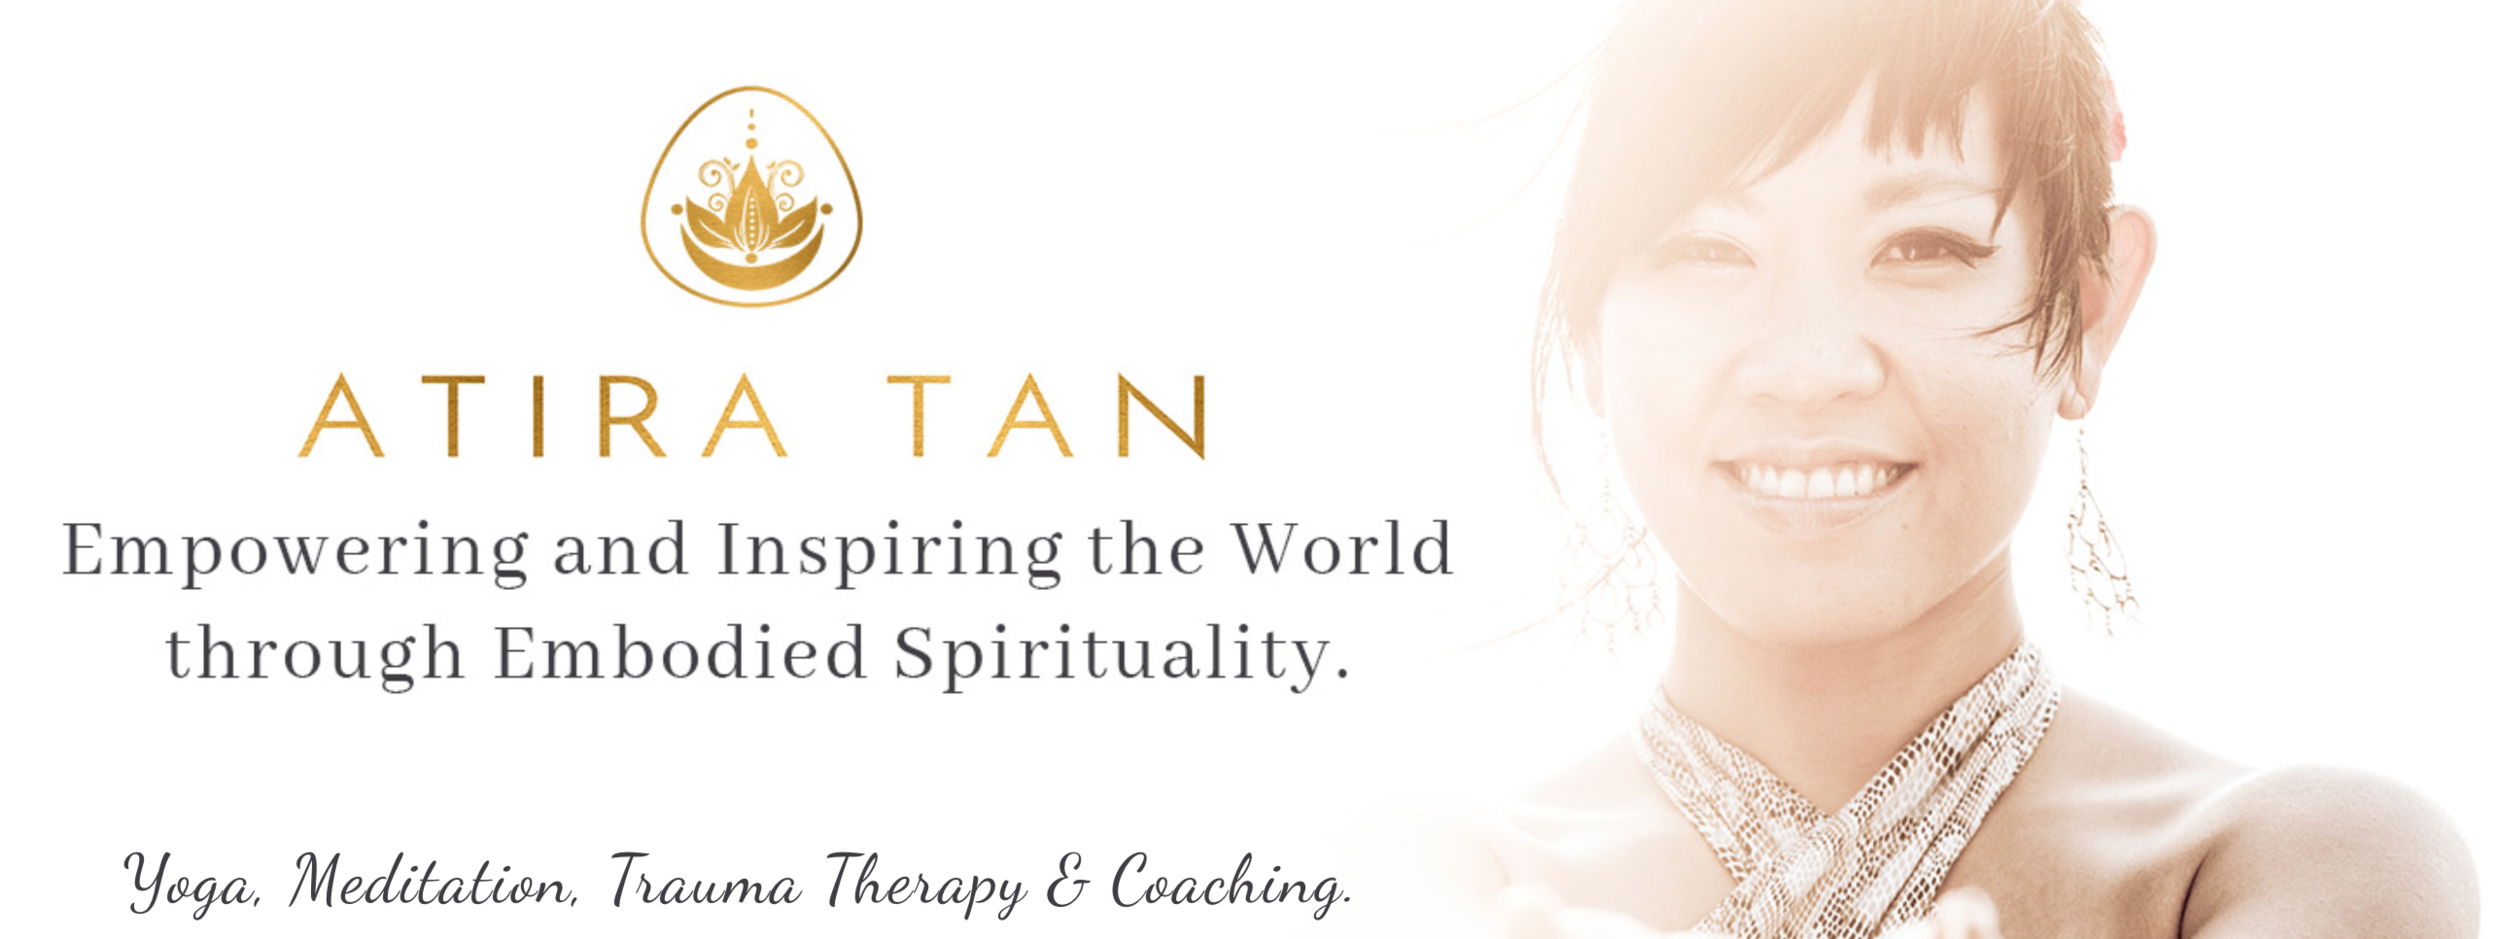 Læs mere om min lærer og guide Atira Tan her:  http://www.atiratan.com/